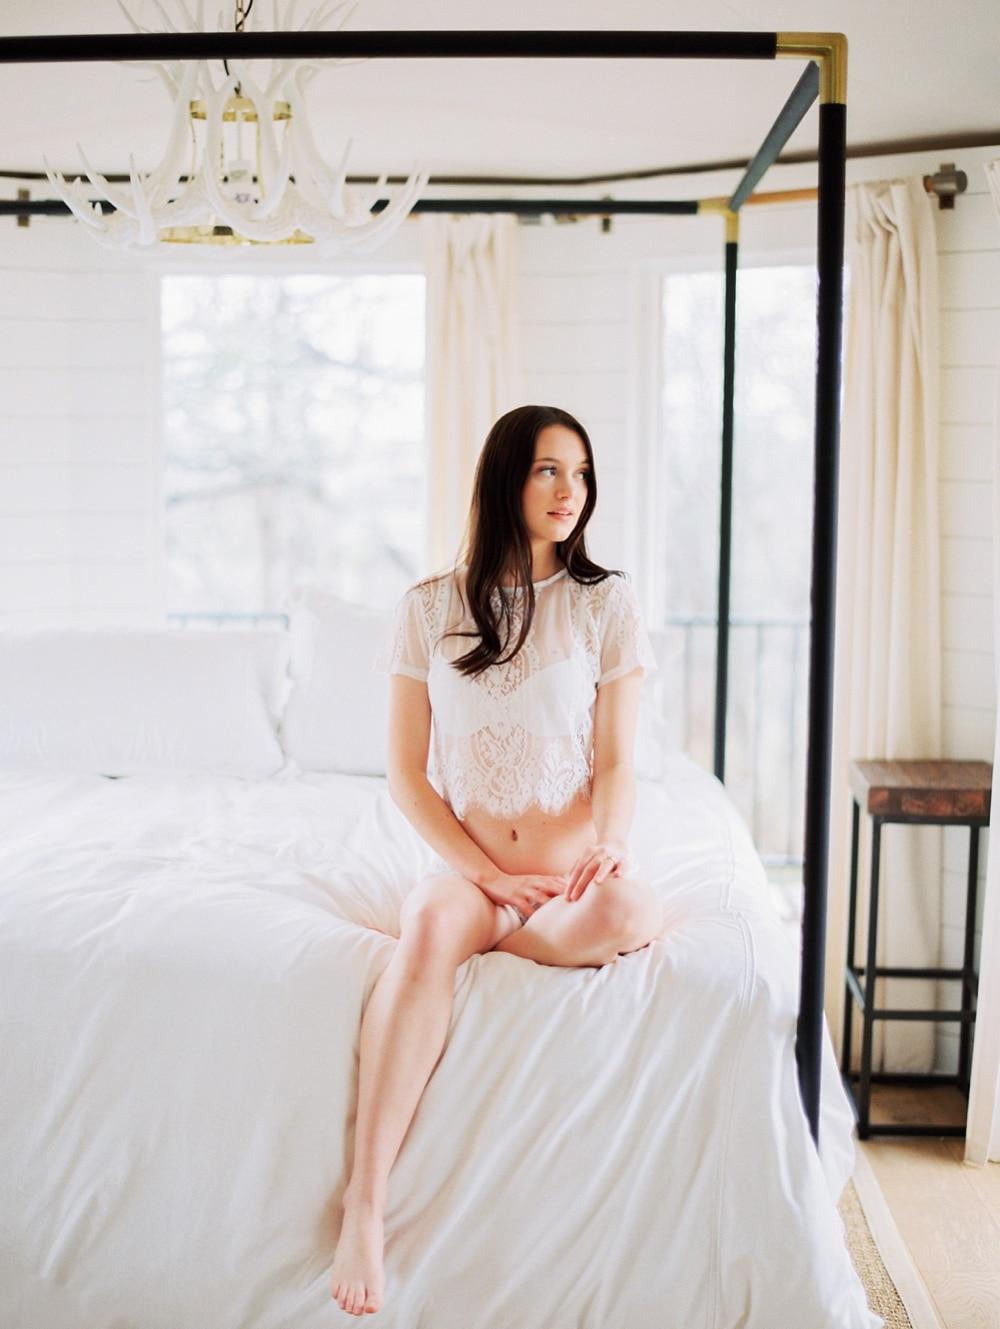 Kristin-La-Voie-Photography-fine-art-wedding-bridal-boudoir-texas-photographer-Dallas-Austin-San-Marcos-wahwahtaysee-resort-43